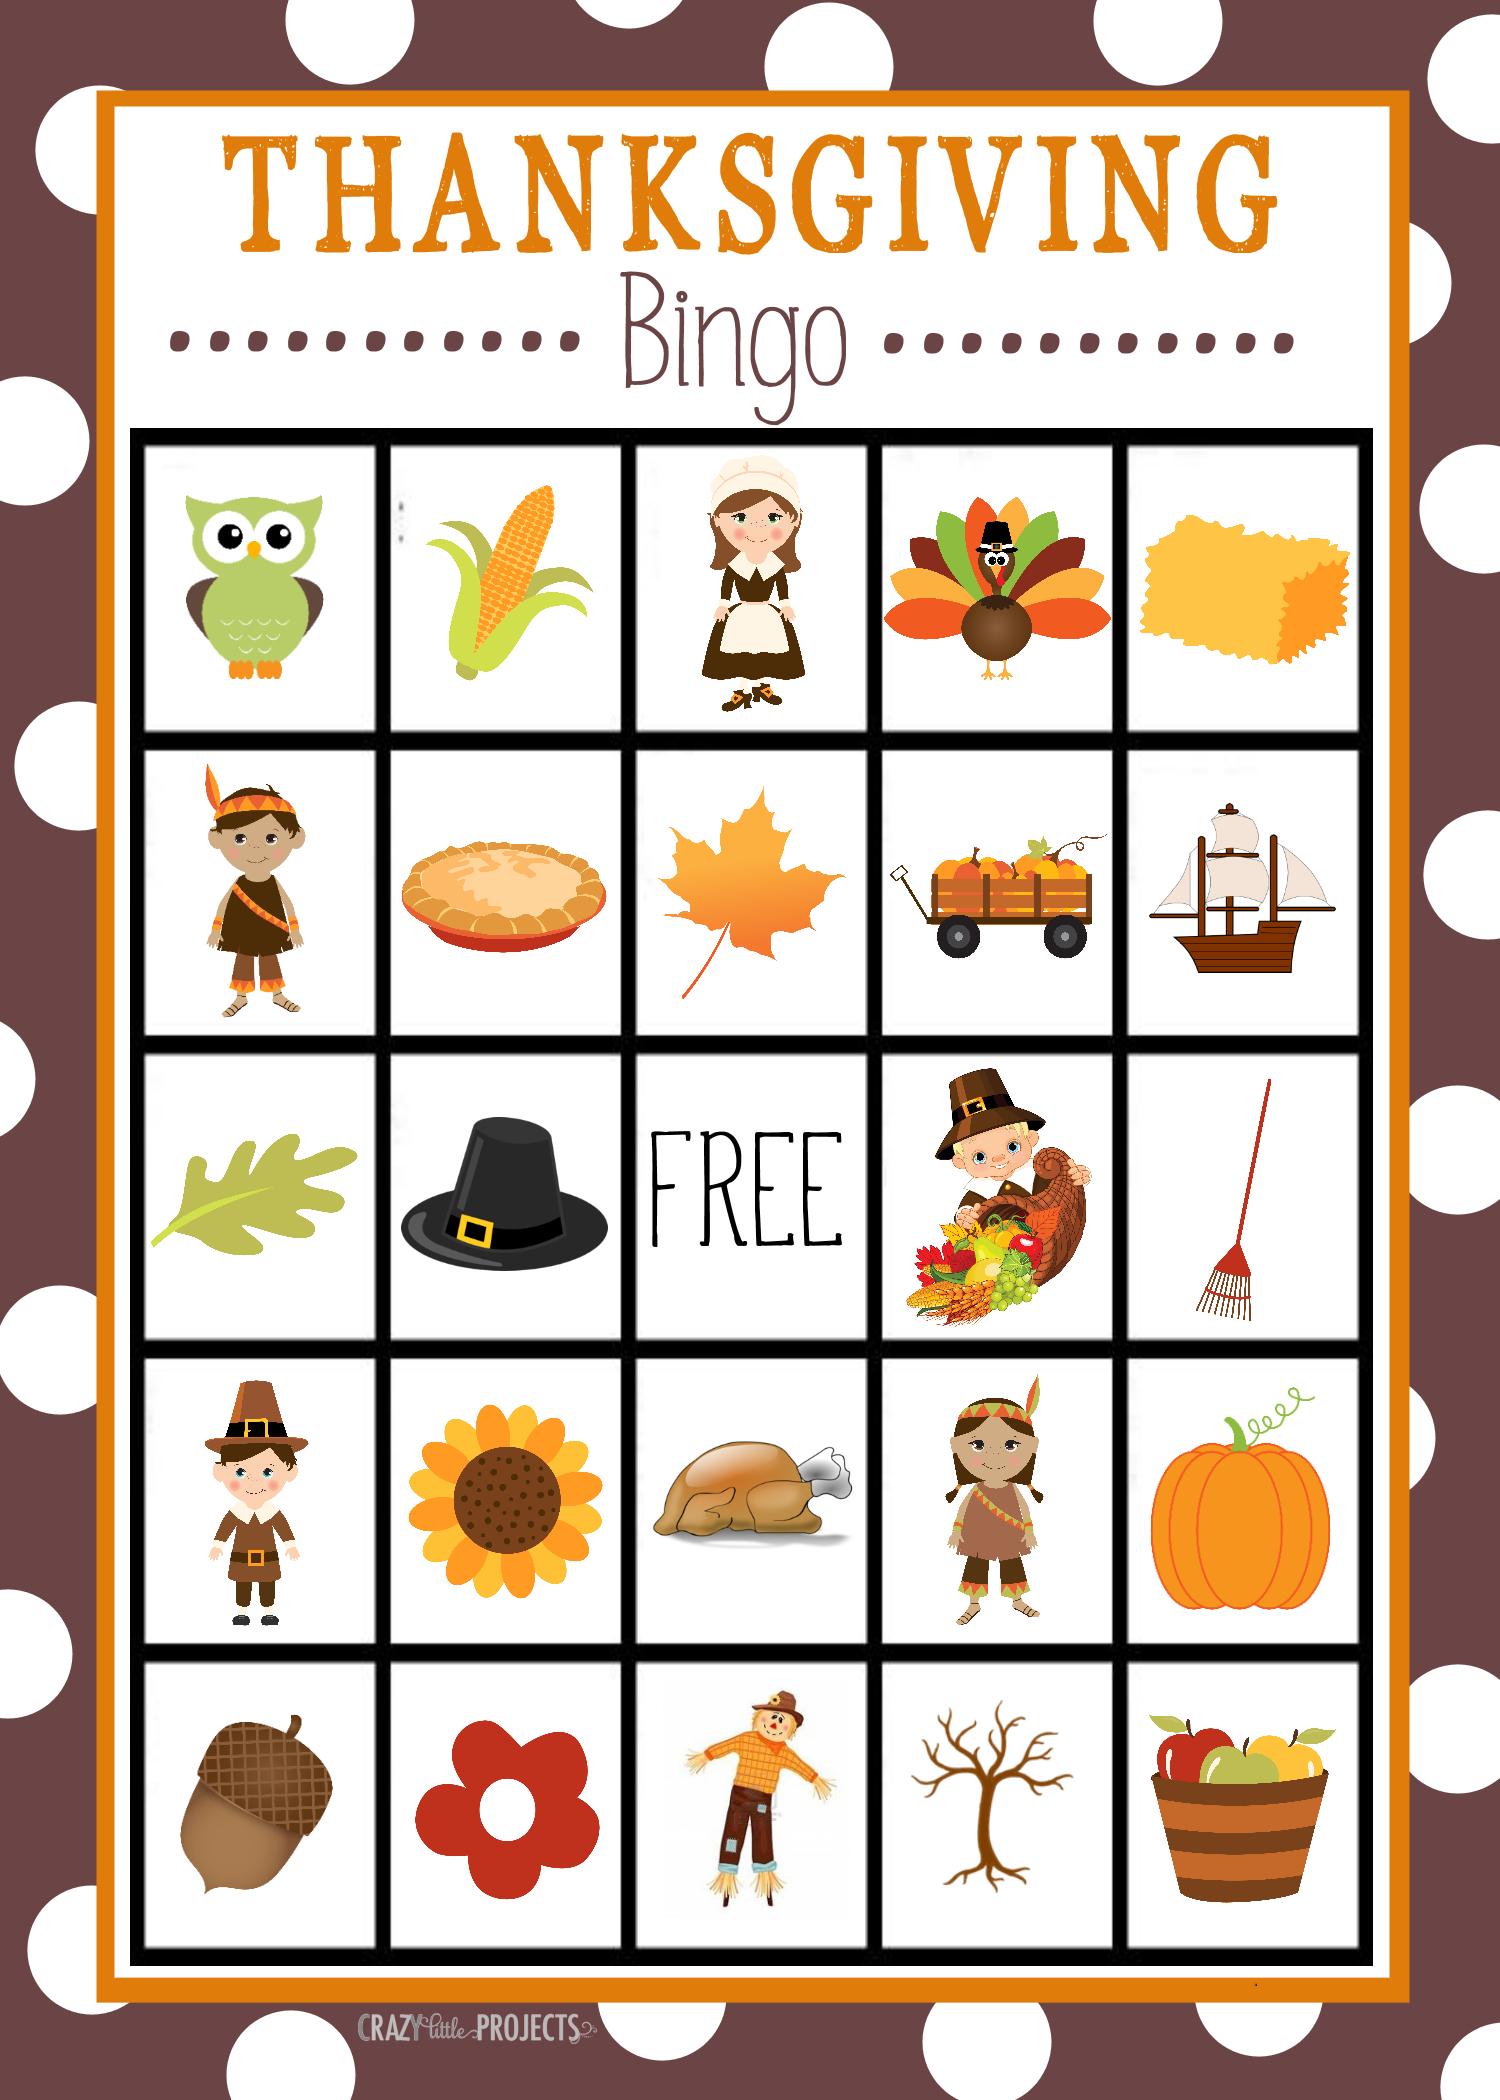 Free Printable Thanksgiving Bingo Game – Fun-Squared - Free Printable Loteria Game